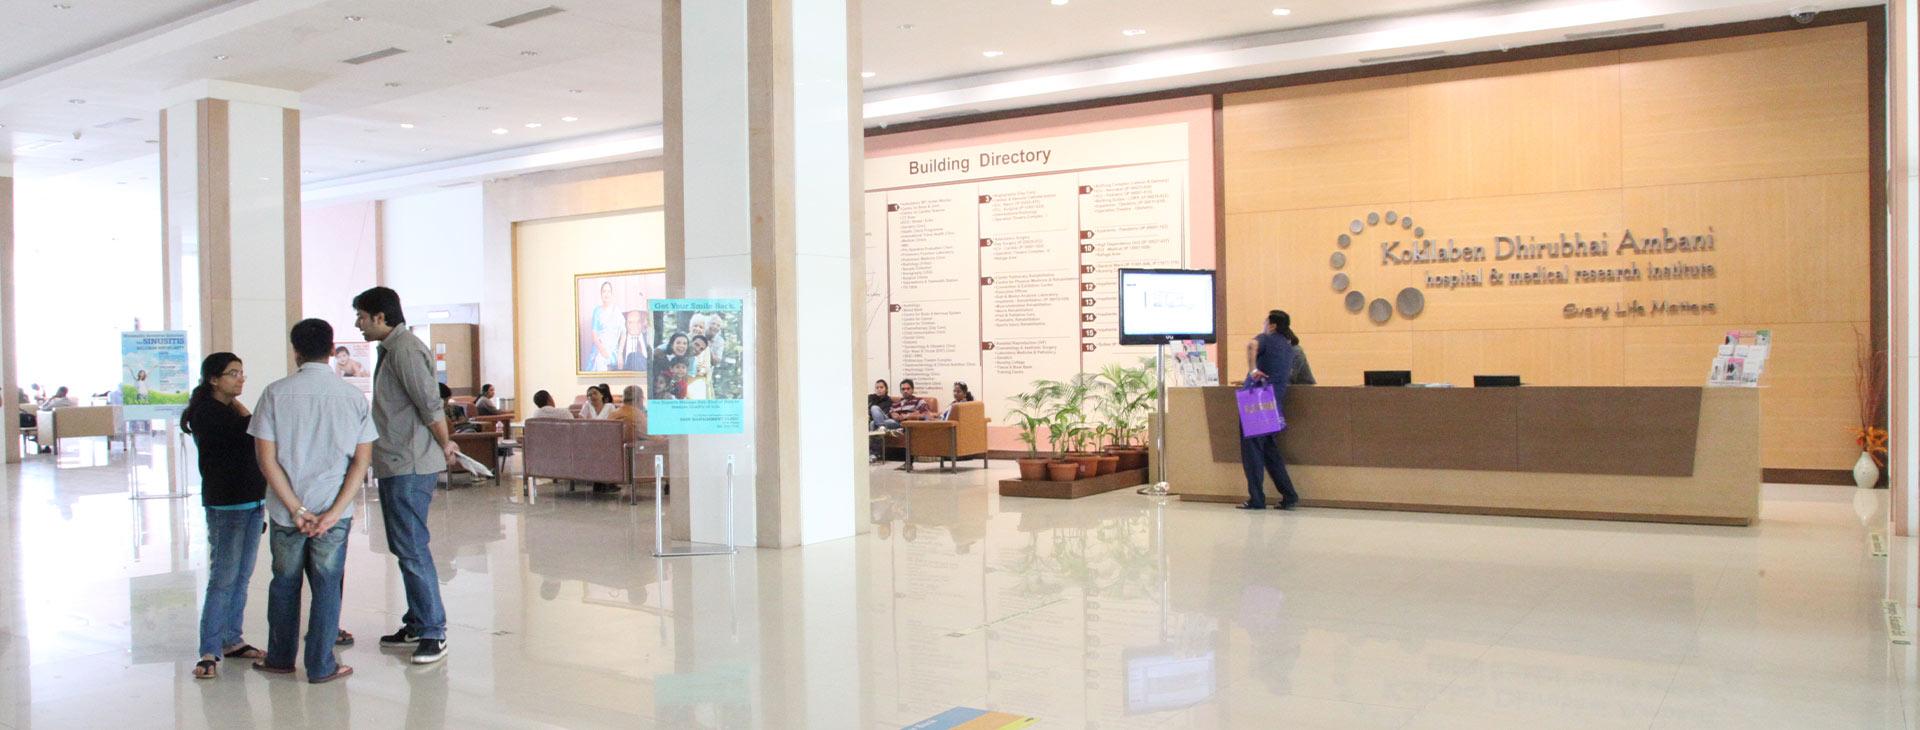 international-patient-amenities